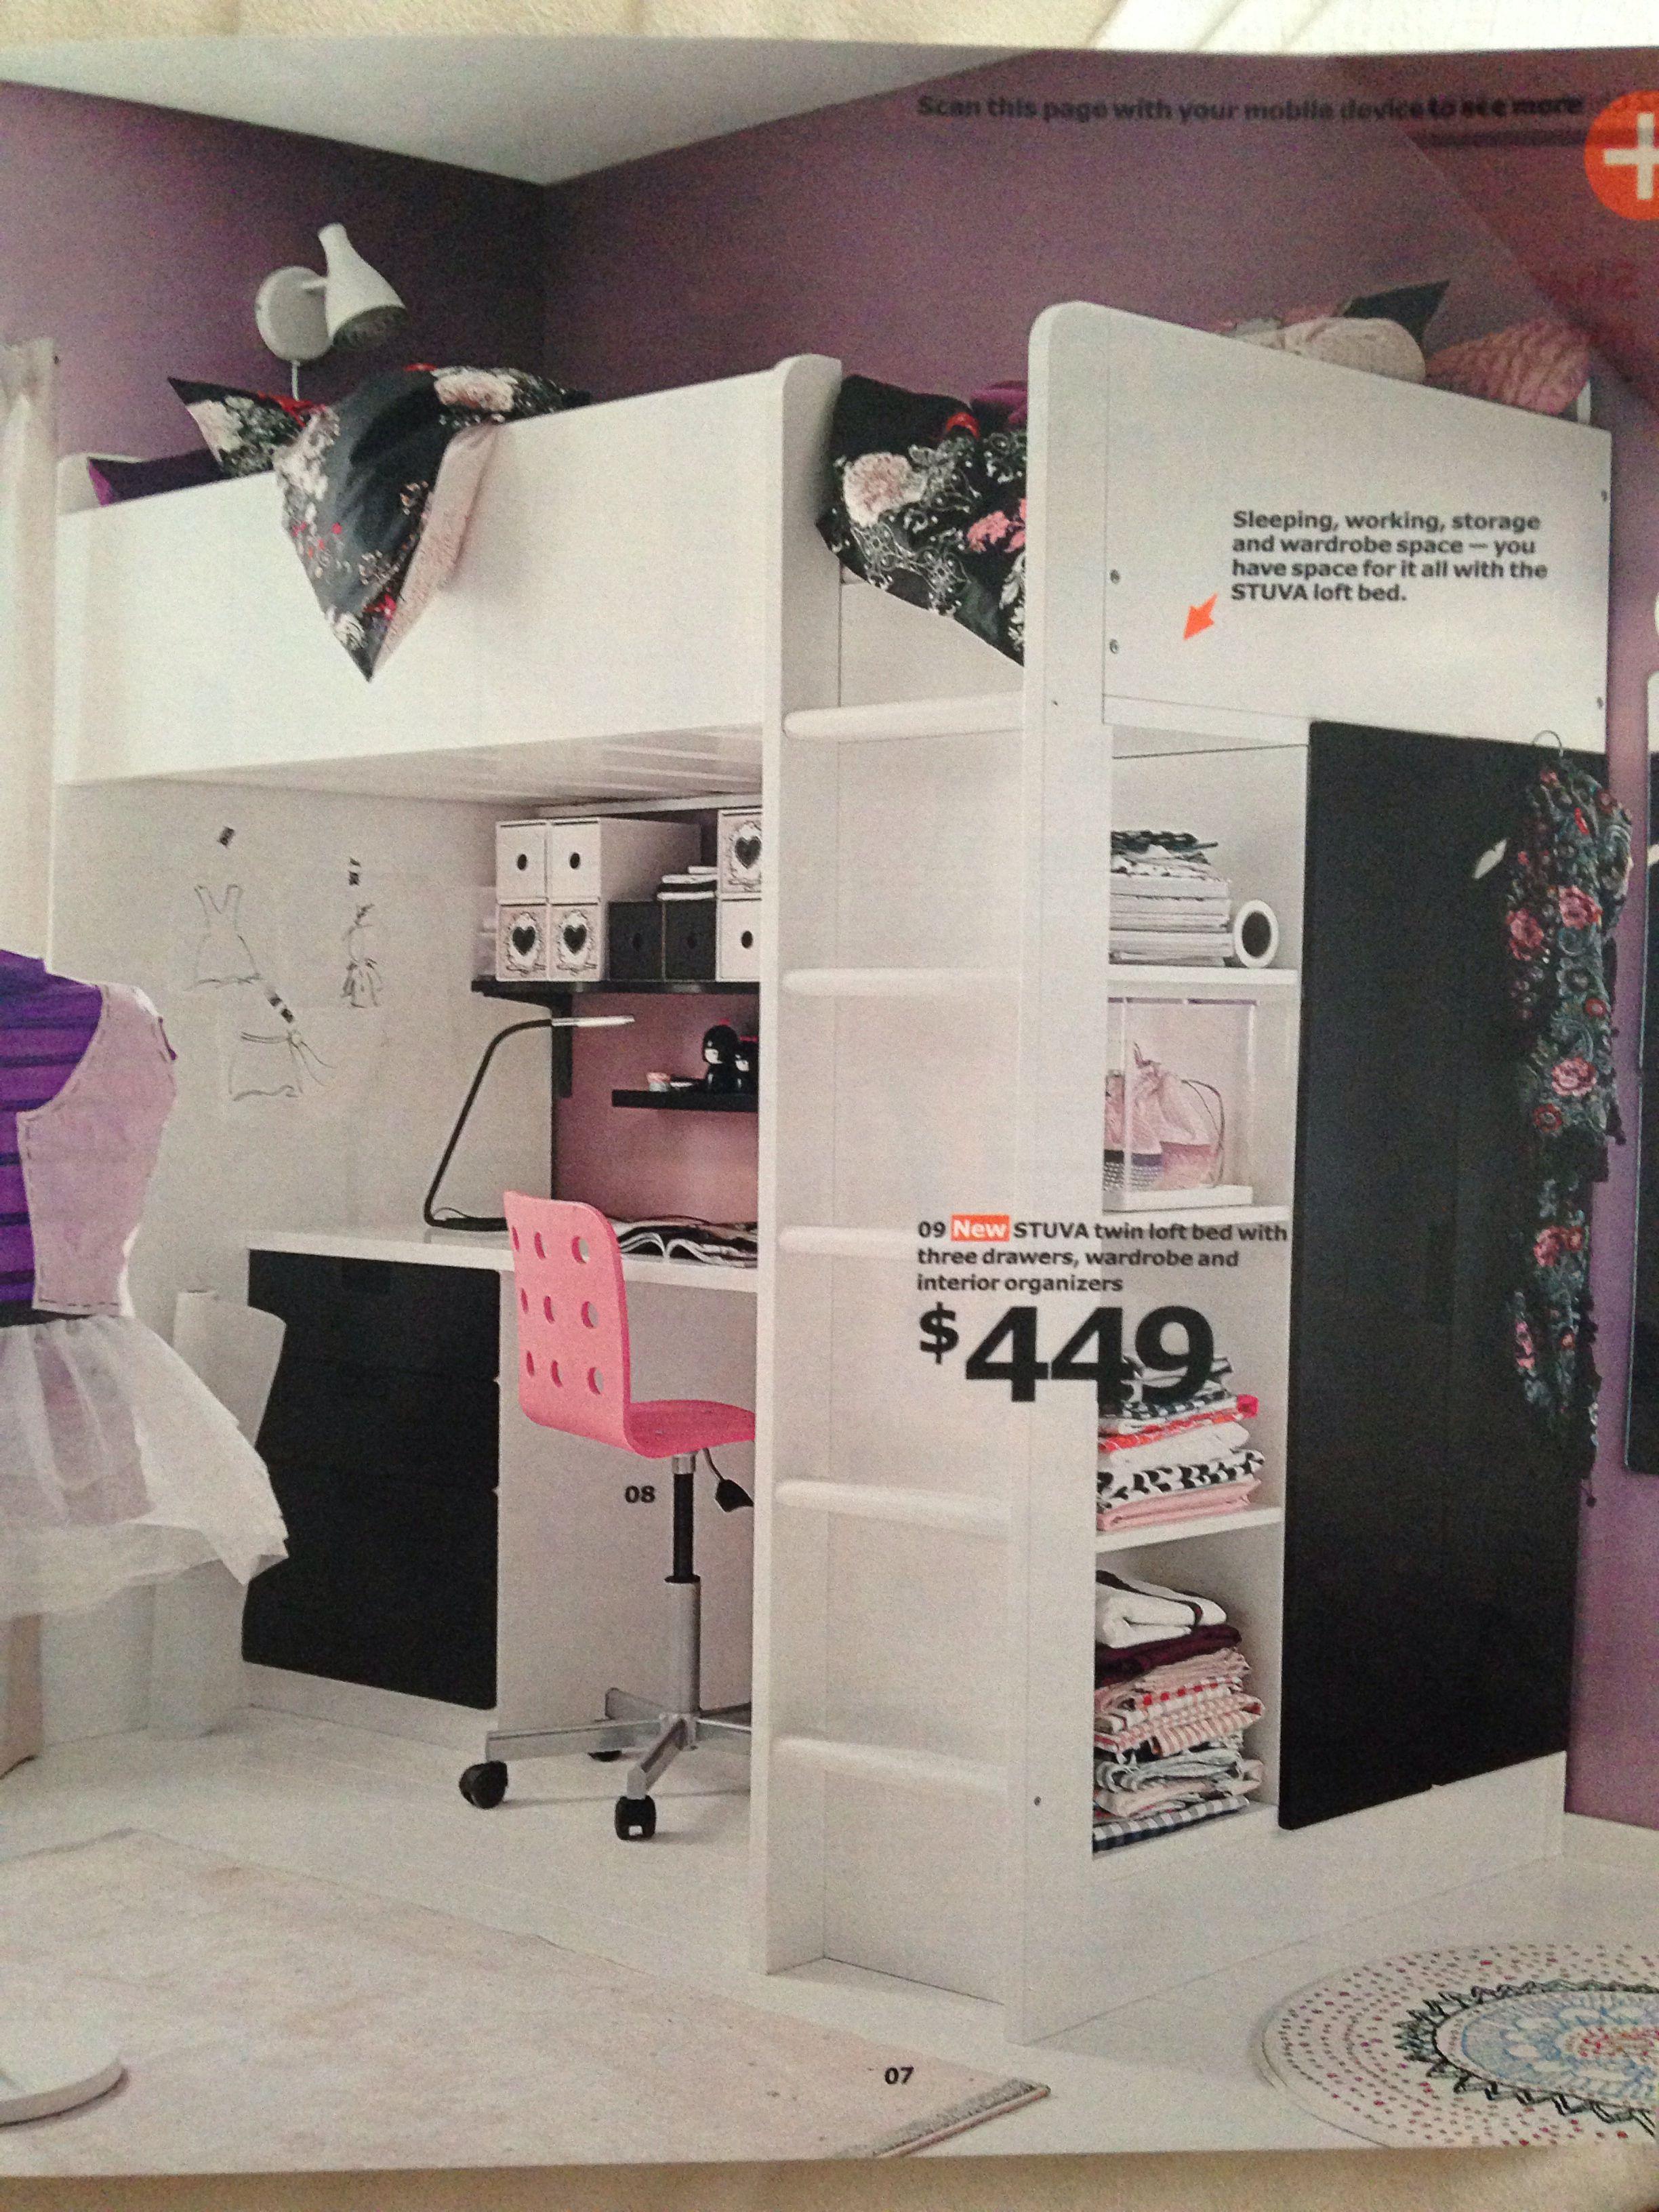 Tiny Box Room Ikea Stuva Loft Bed Making The Most Of: Ikea Fall 2014. STUVA Twin Loft Bed With Three Drawers